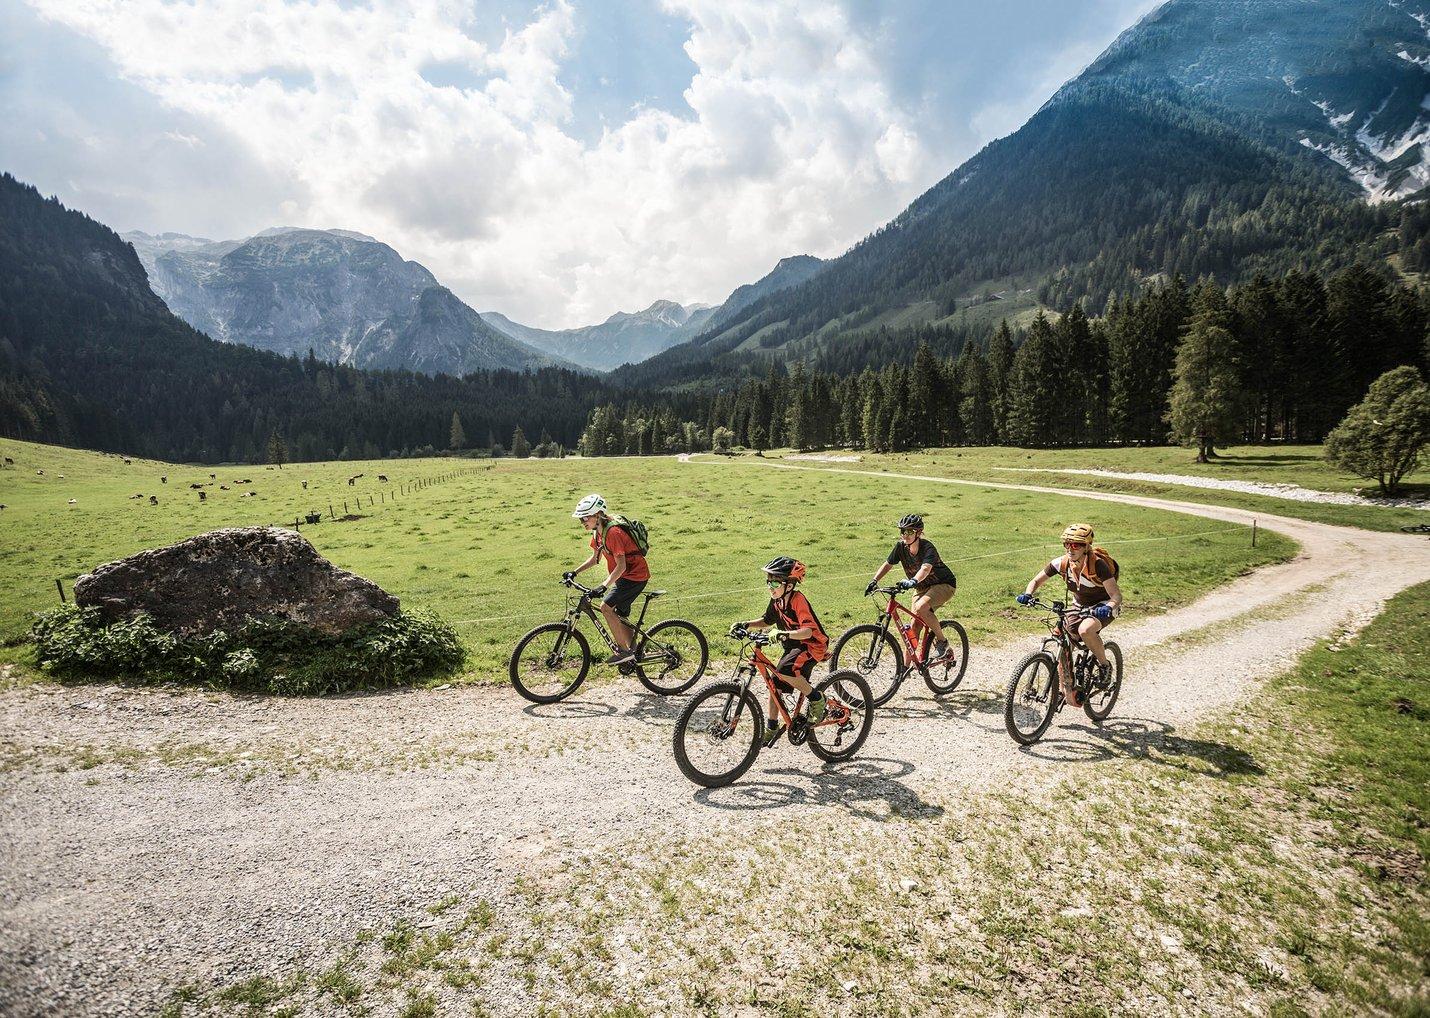 Bikeurlaub familienhotel flachau fahrradurlaub österreich aktiv mit Kindern